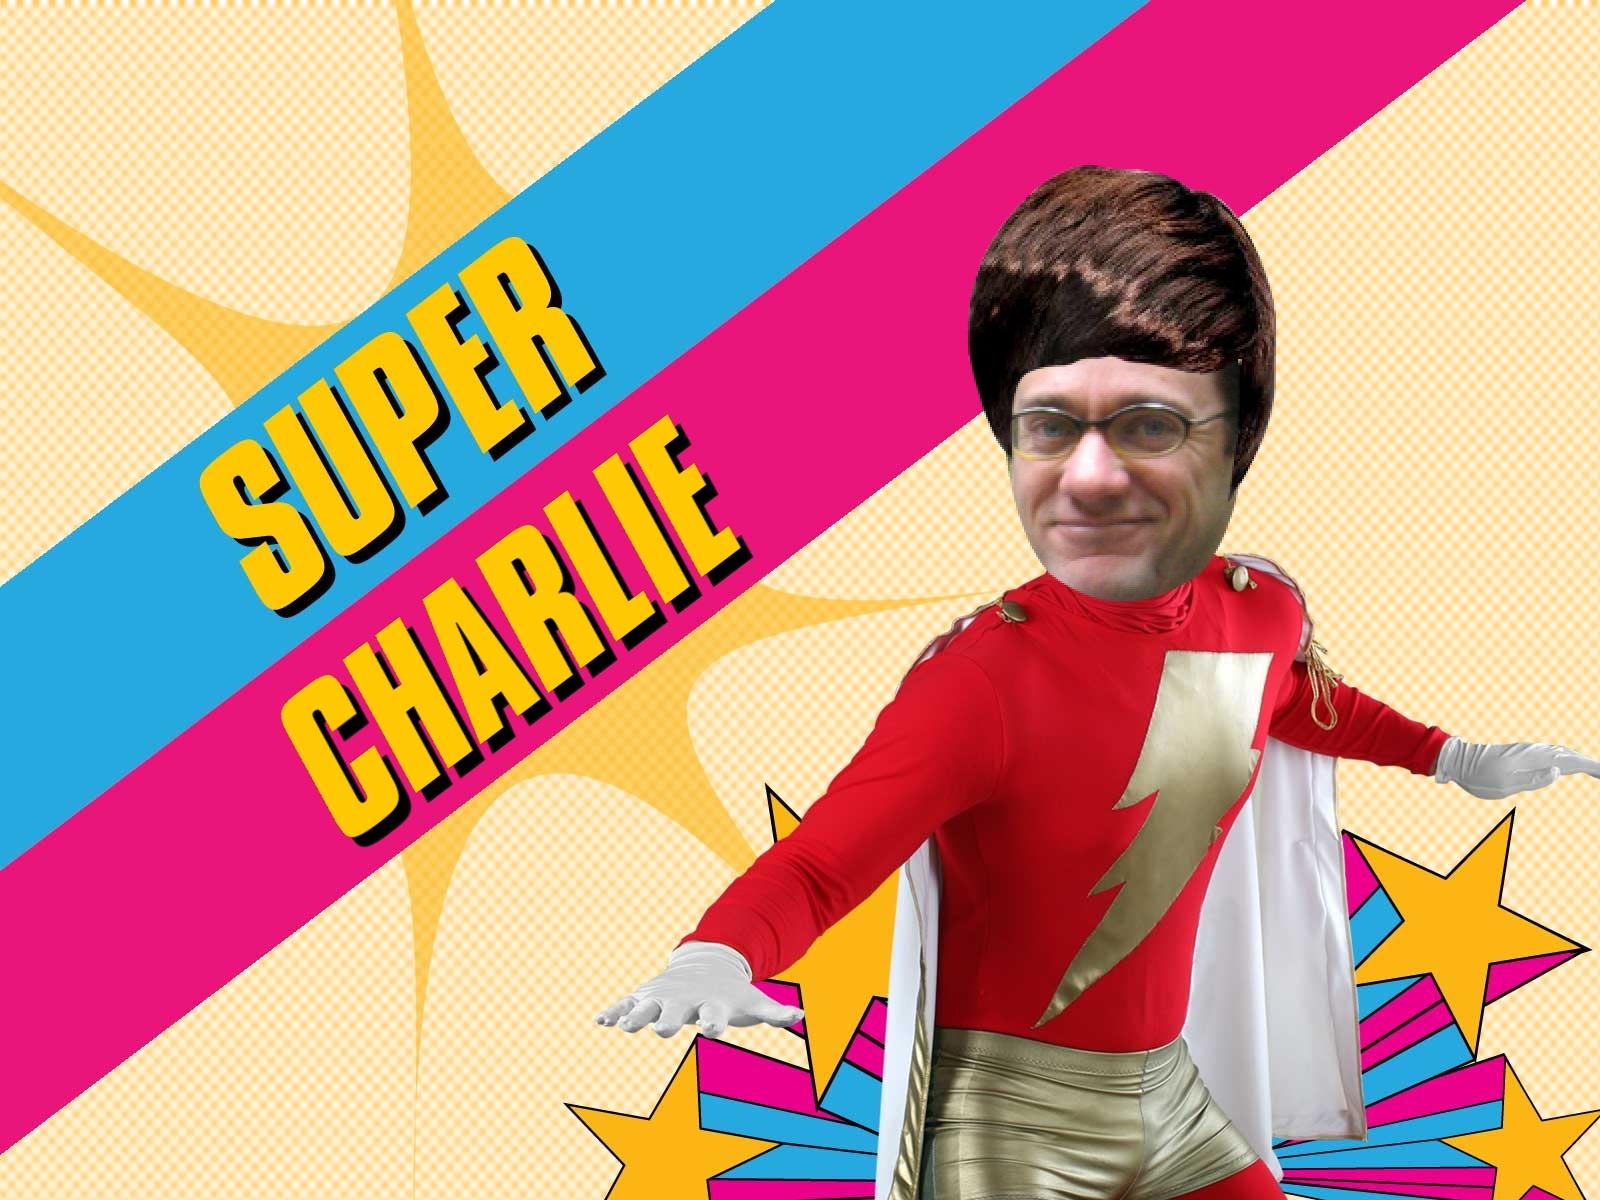 super-charlie.jpg